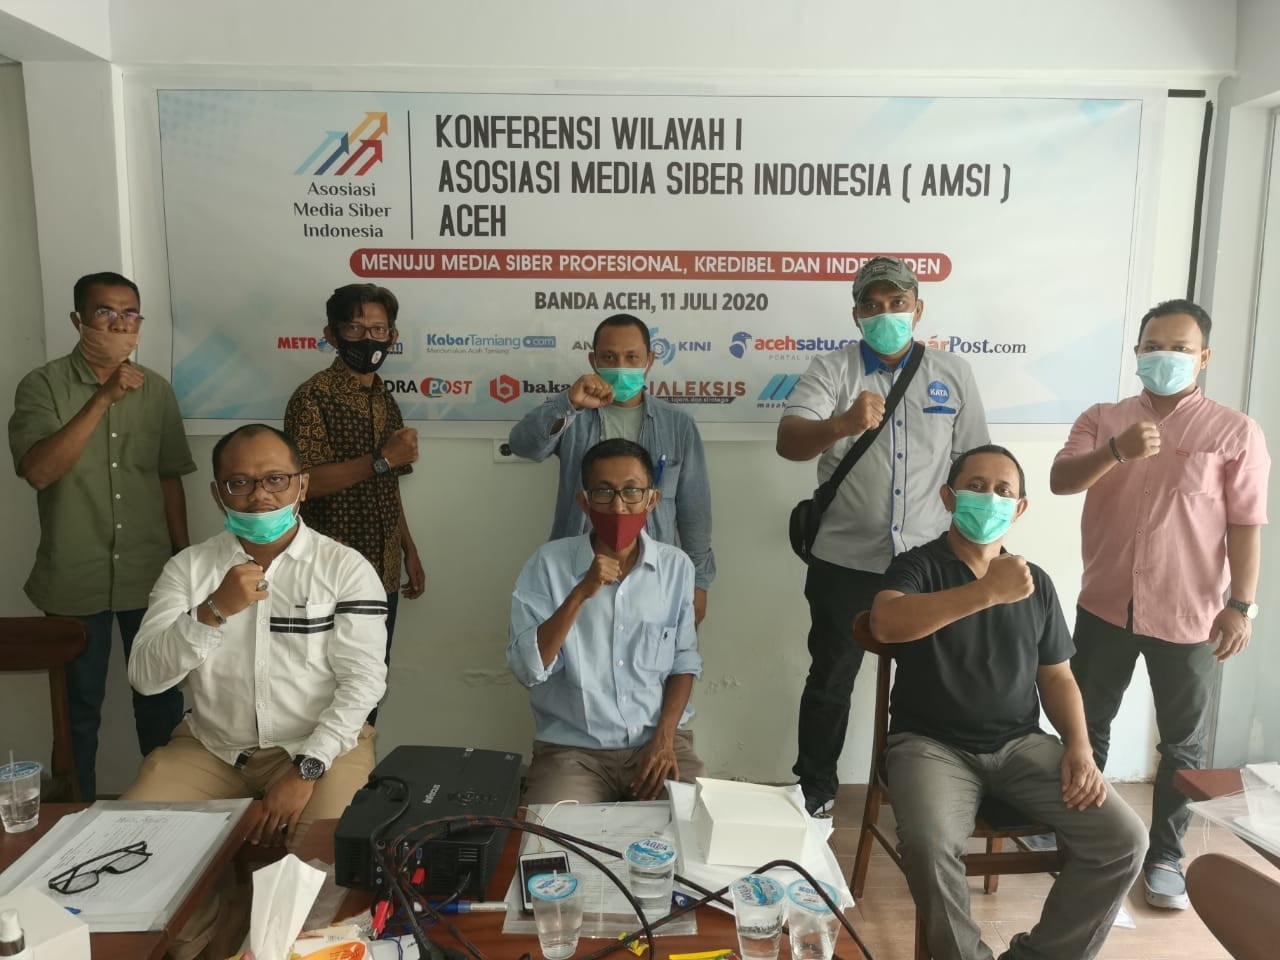 Pengurus AMSI Aceh Terbentuk, Maimun Saleh Pimpin Periode 2020-2023